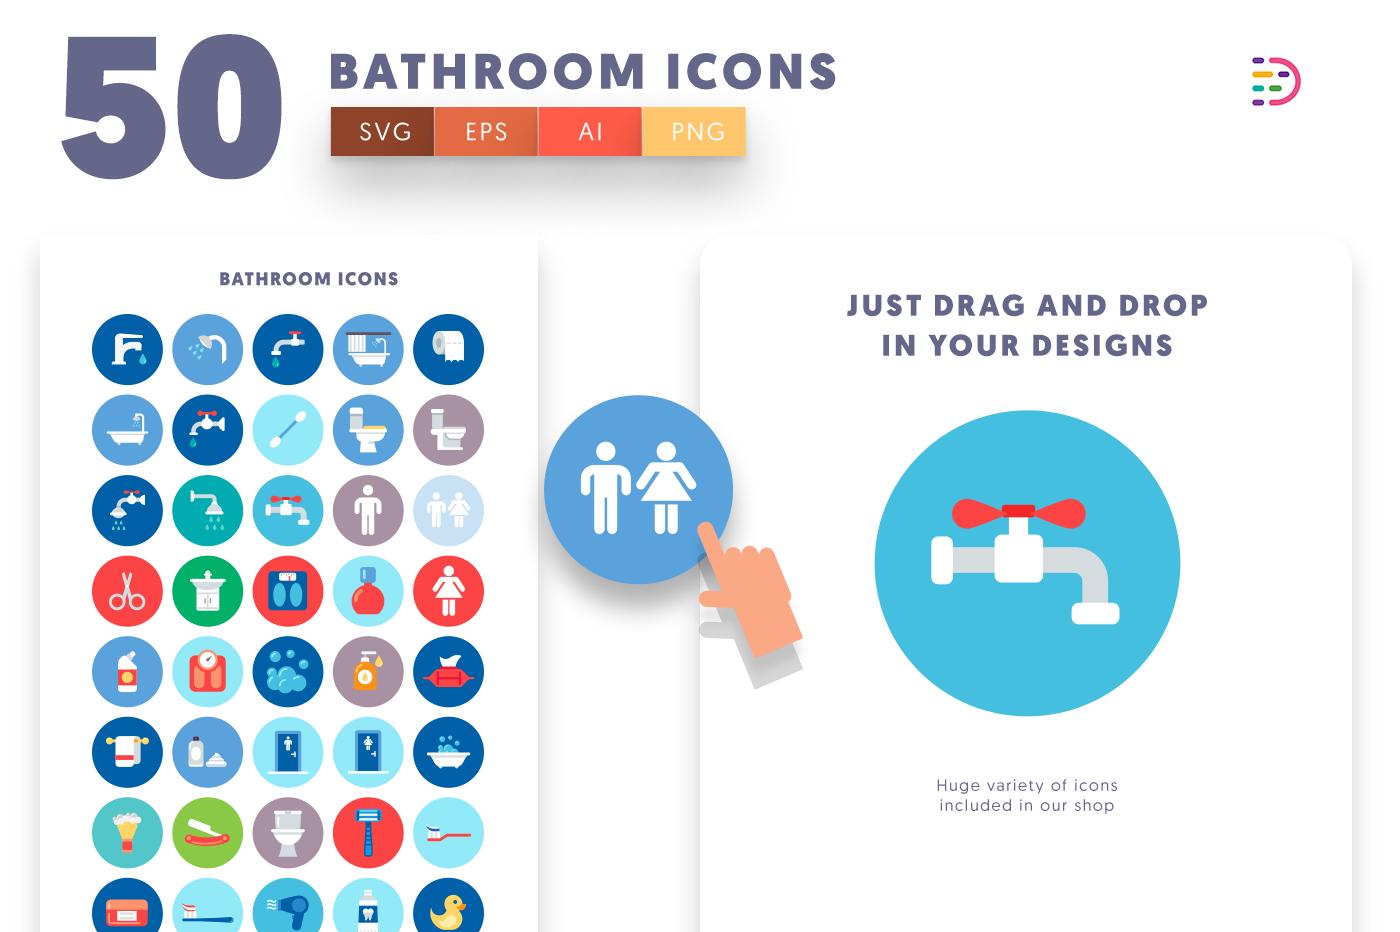 Drag and drop vector 50 Bathroom Icons